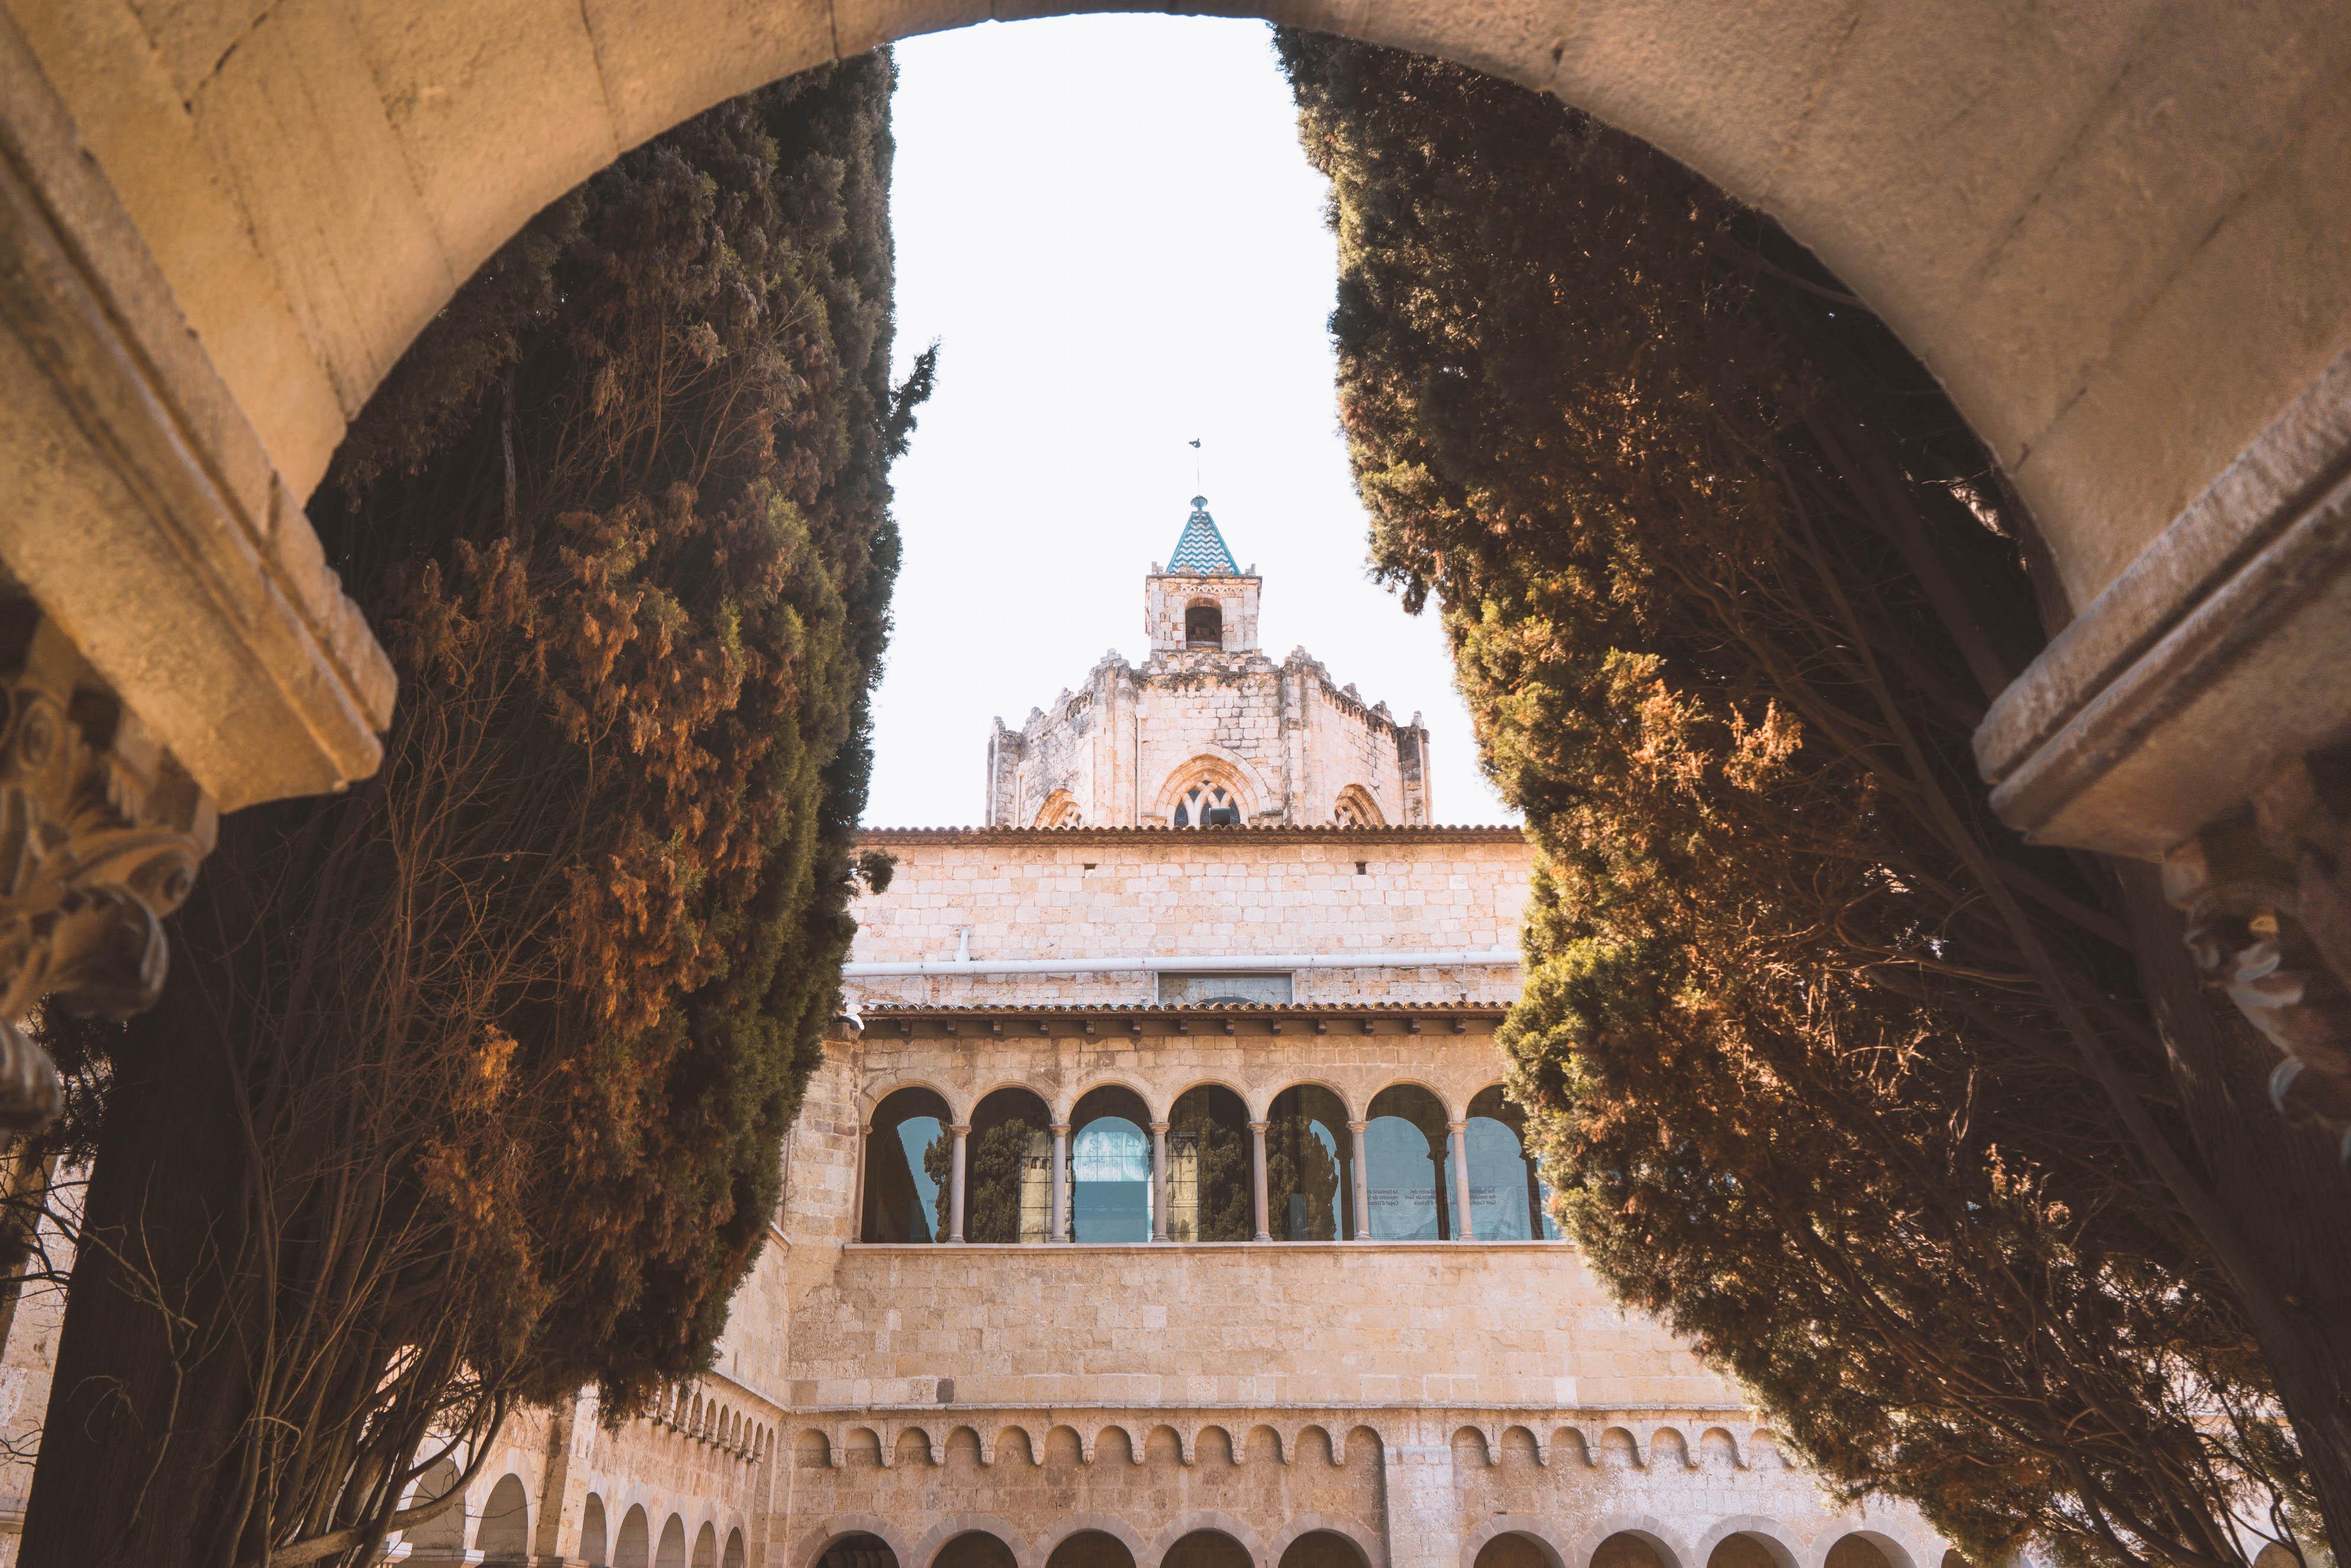 klooster medieval art